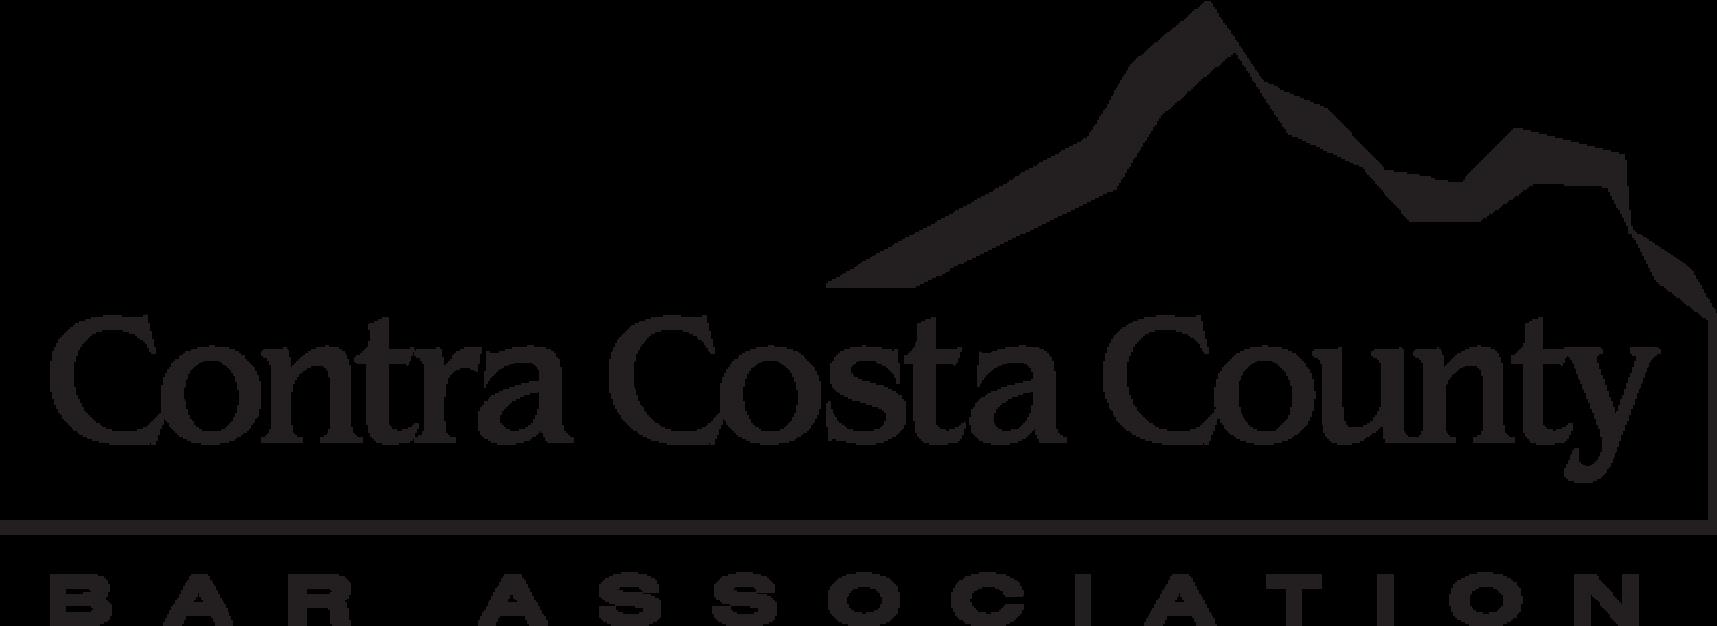 Contra Costa County Bar